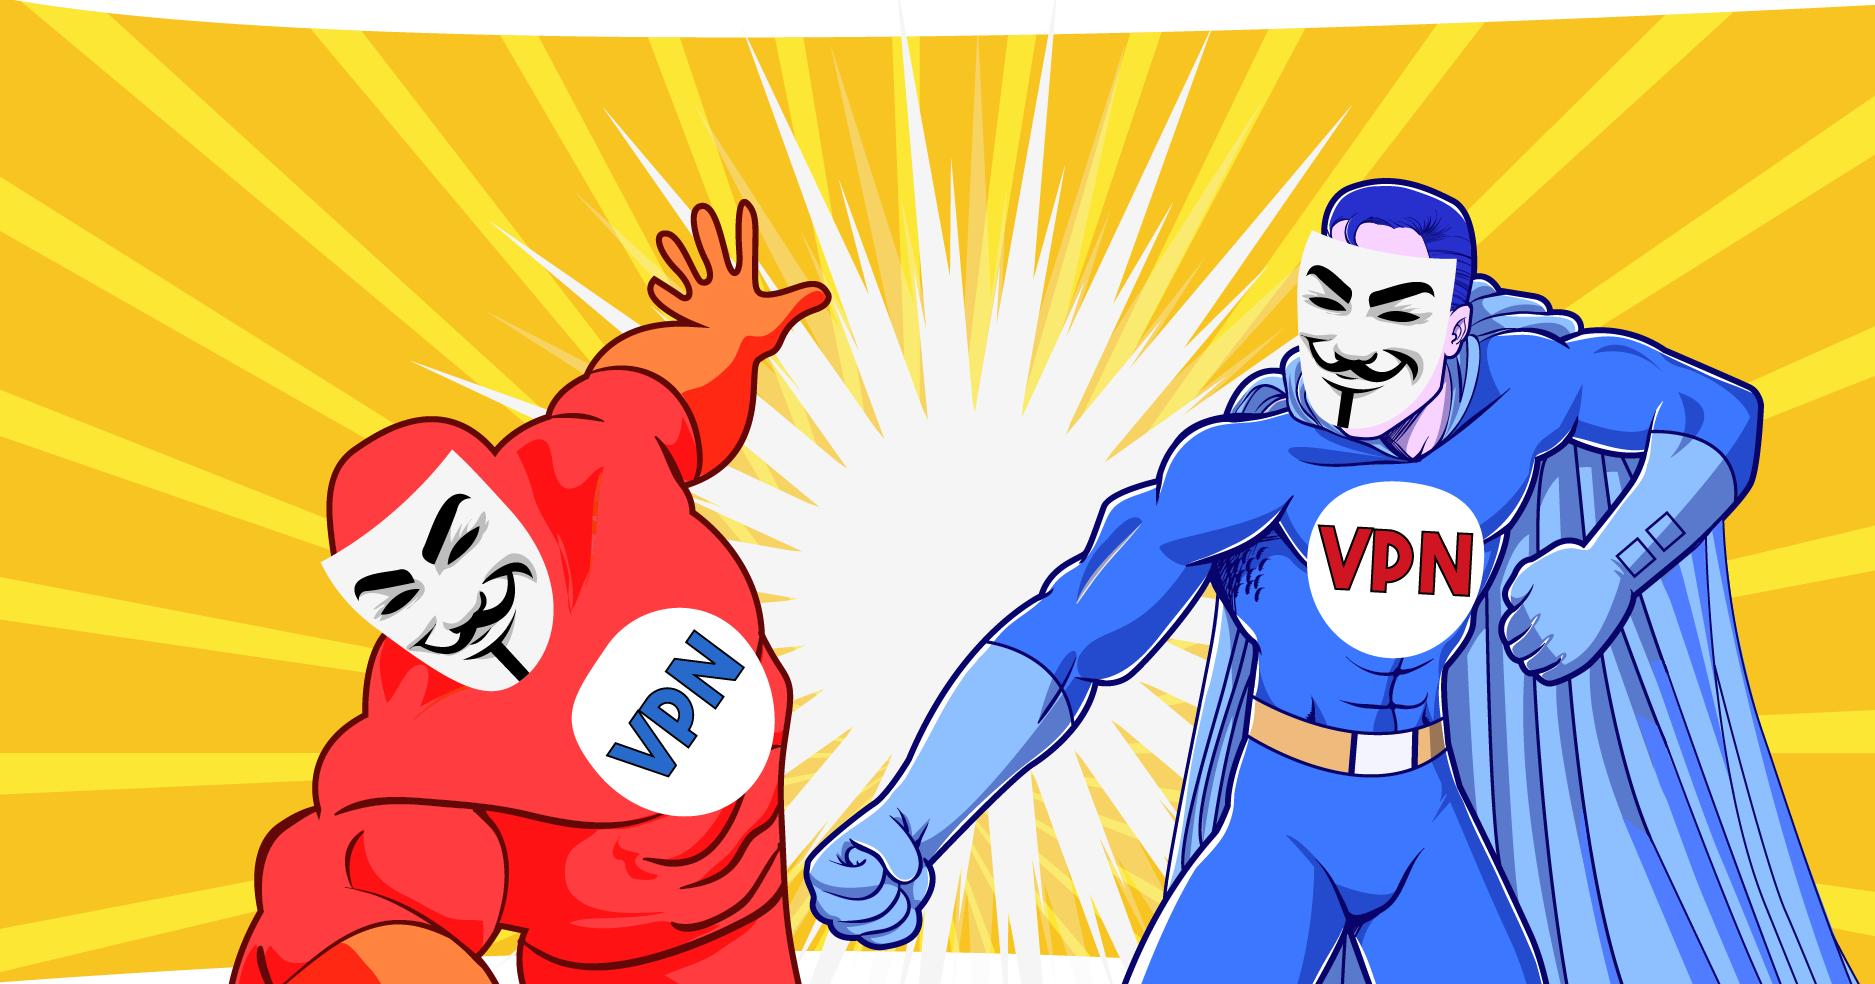 www.vpnmentor.com